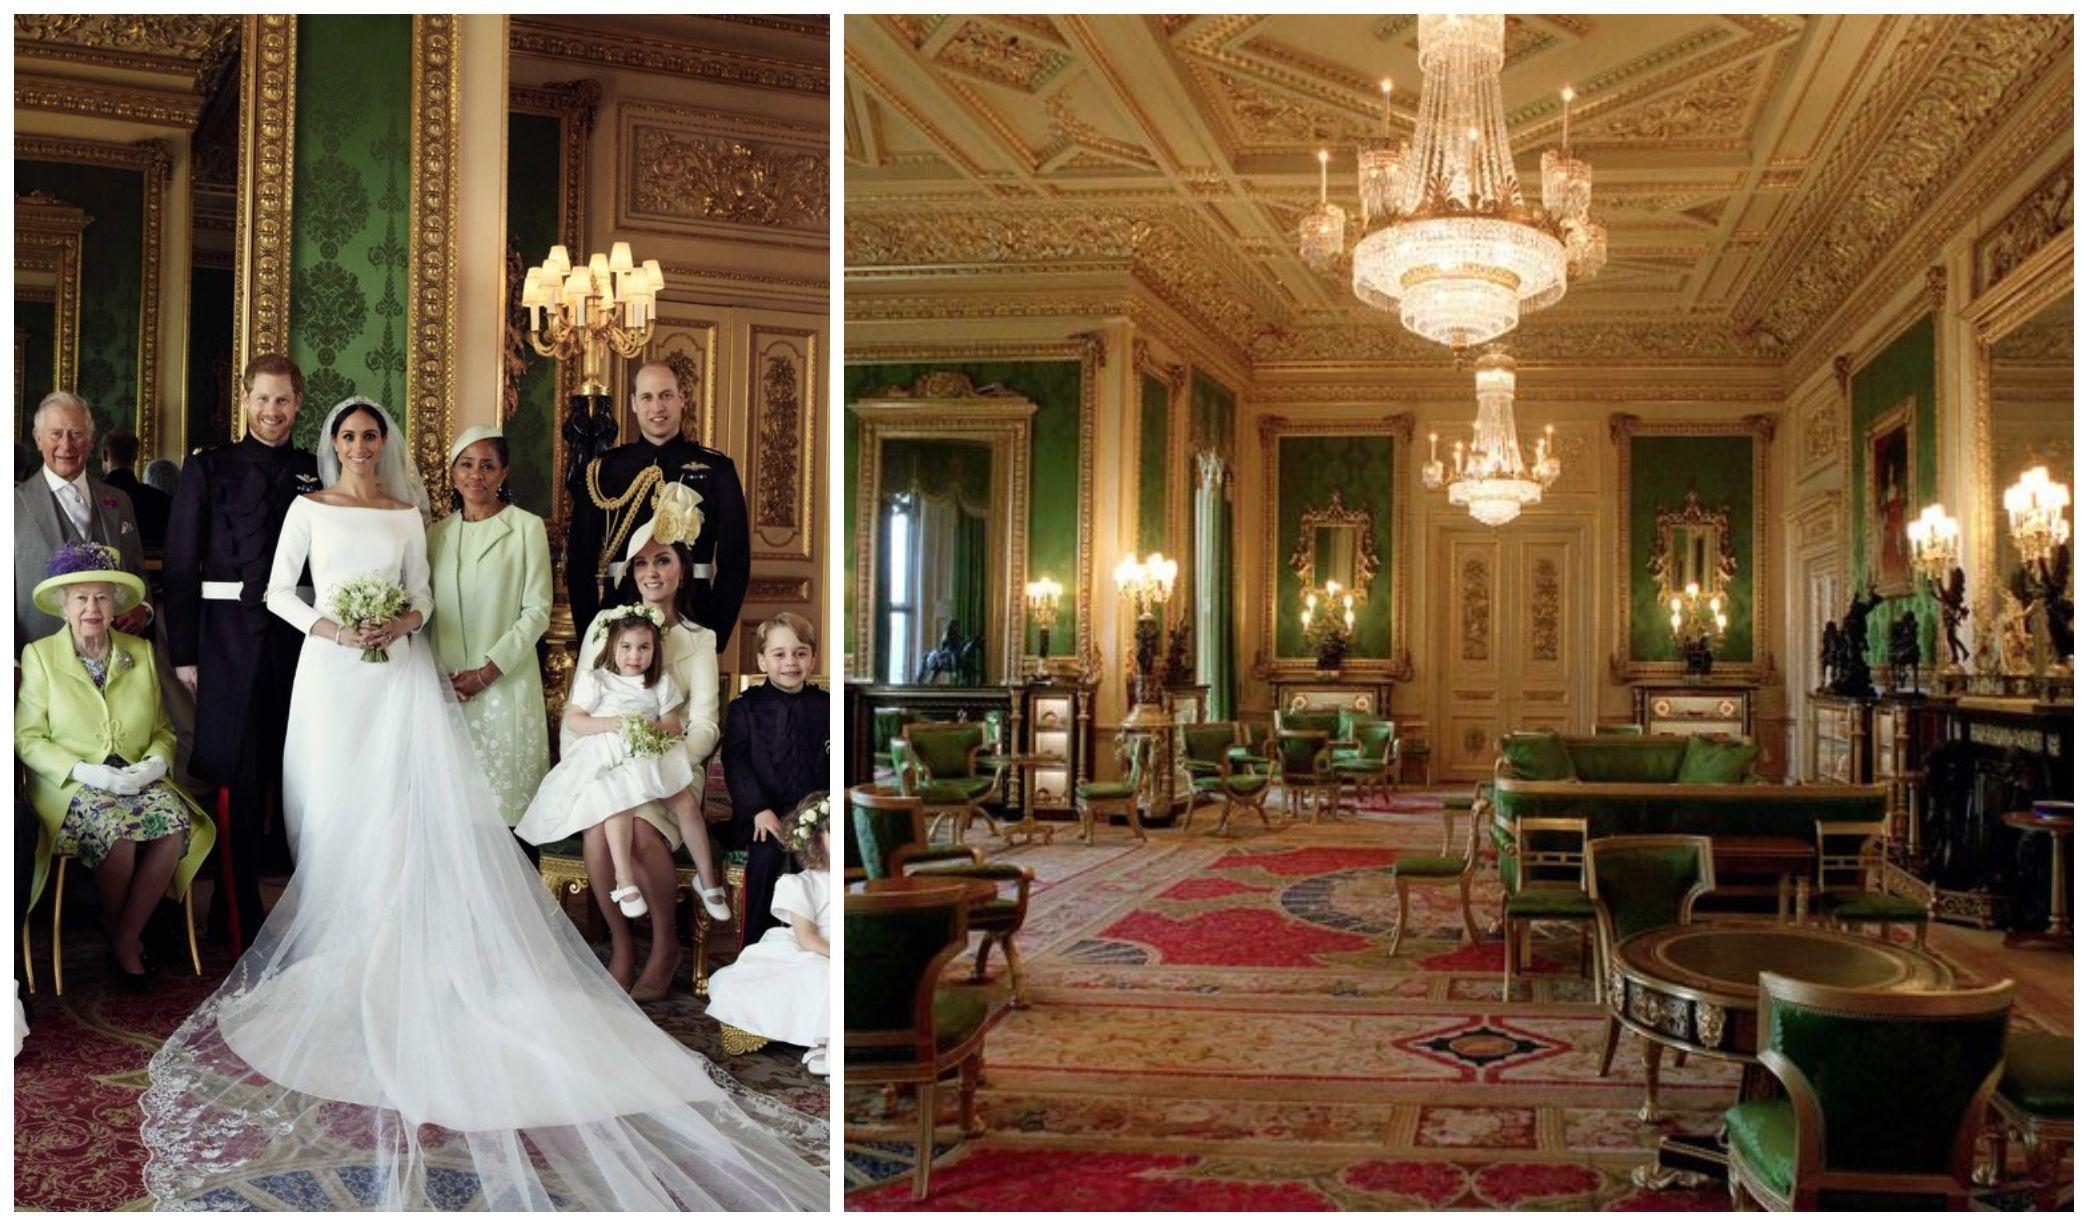 Windsor Castles Green Drawing Room